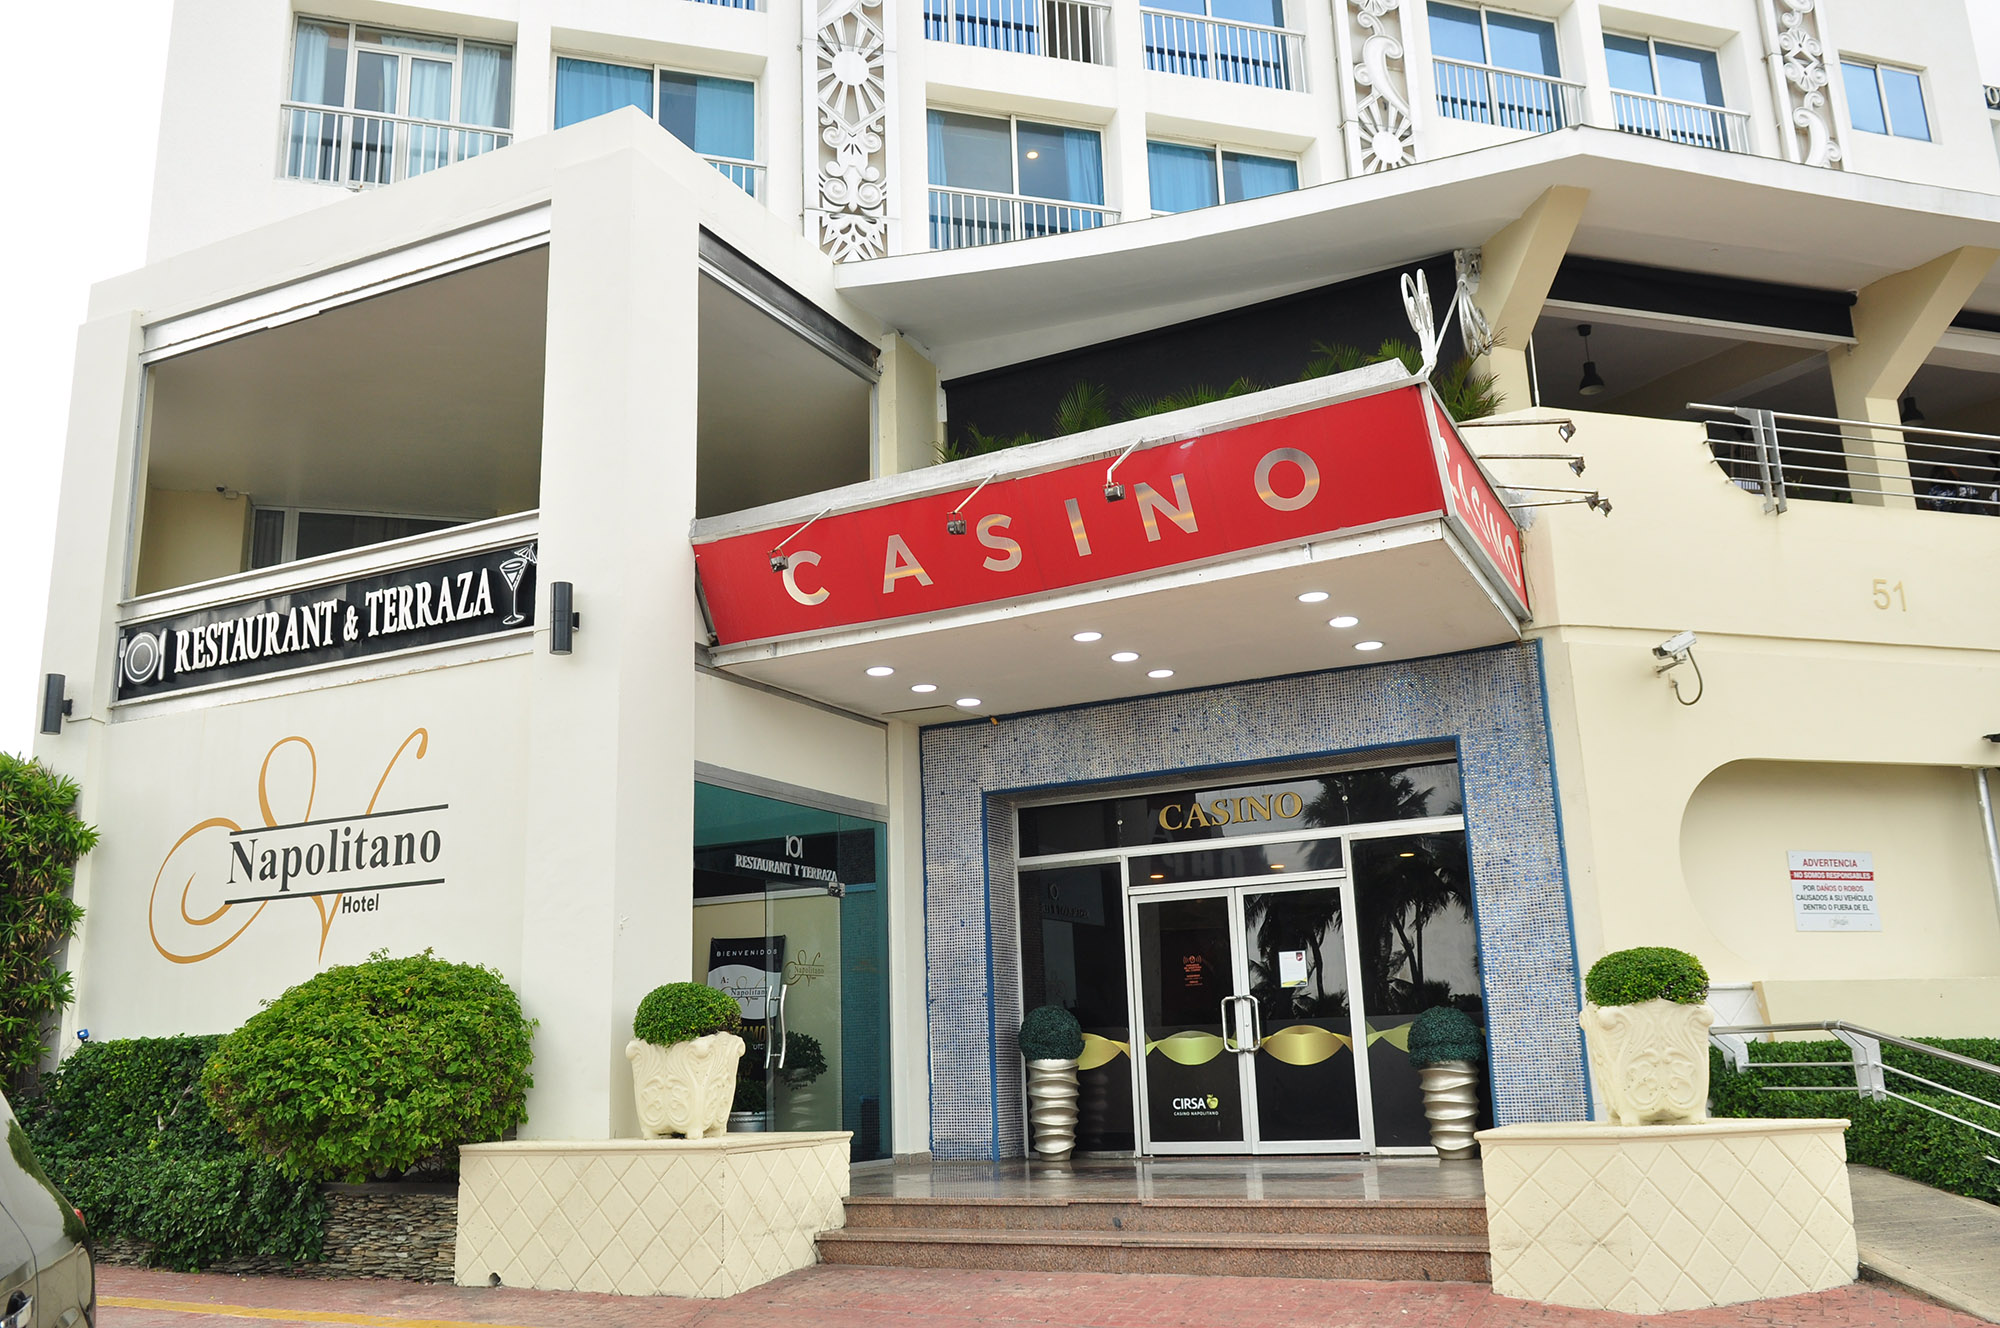 Casino Napolitano Exterior